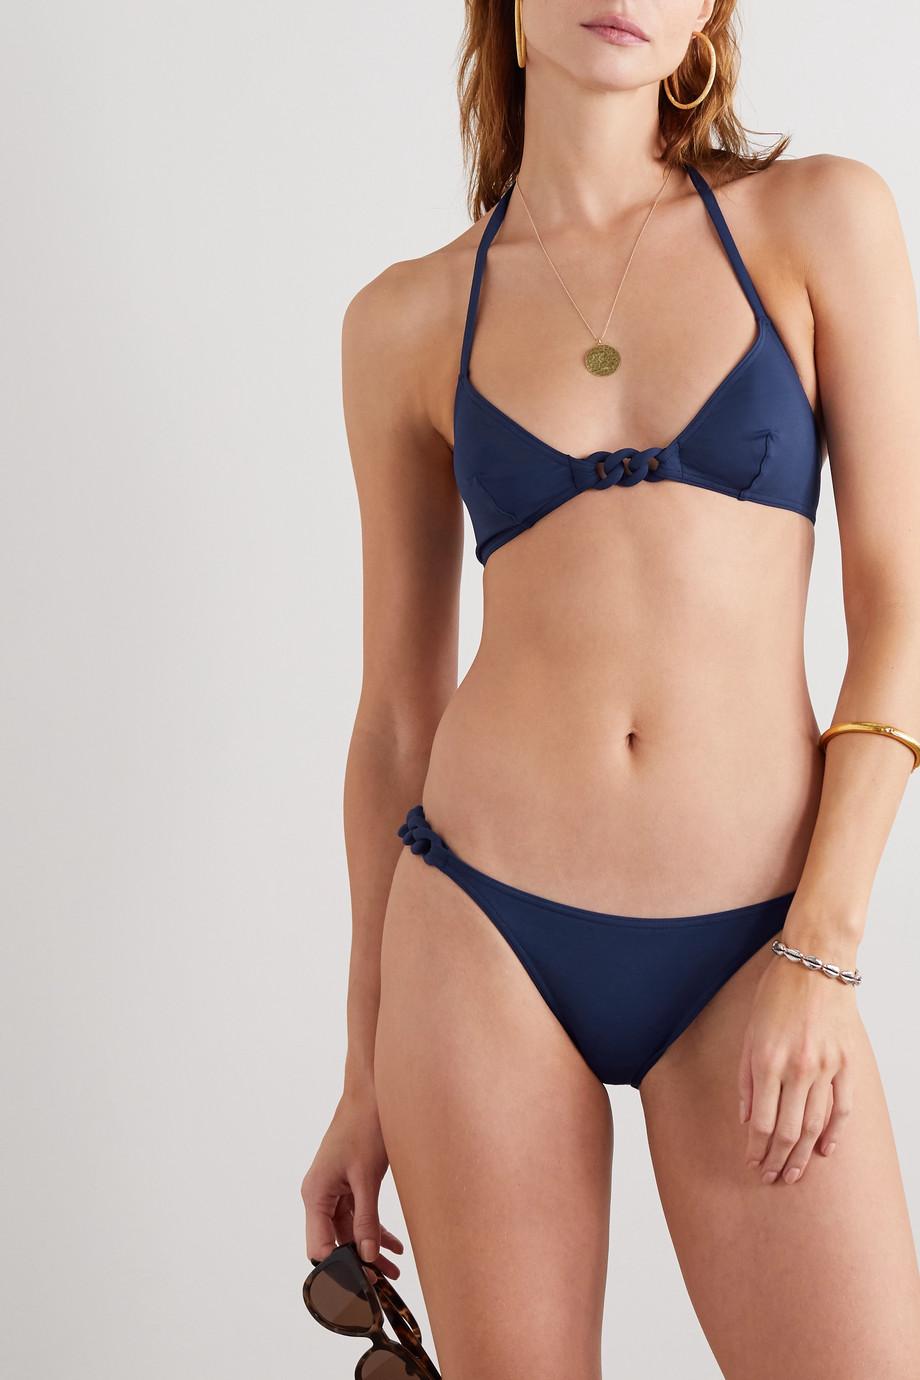 Eres Gourmette Manchette braided halterneck triangle bikini top